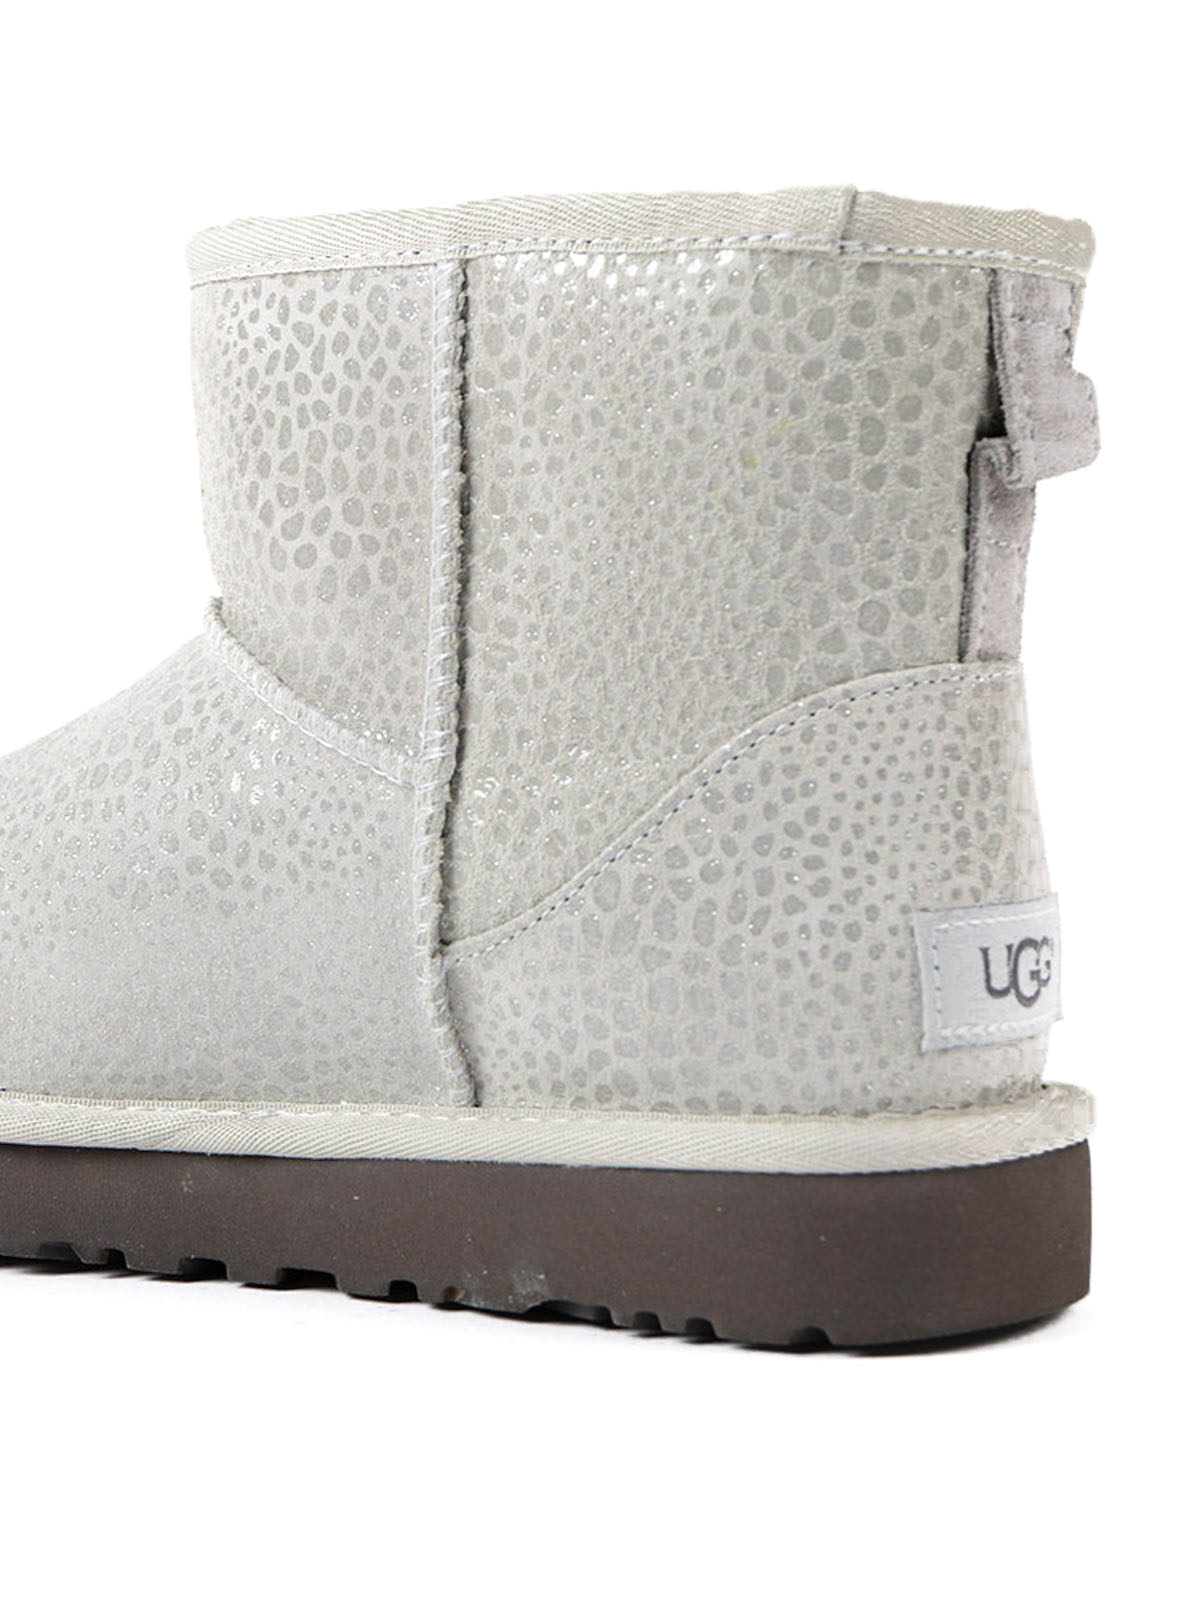 Mini Glitzy grey shiny booties shop online: UGG